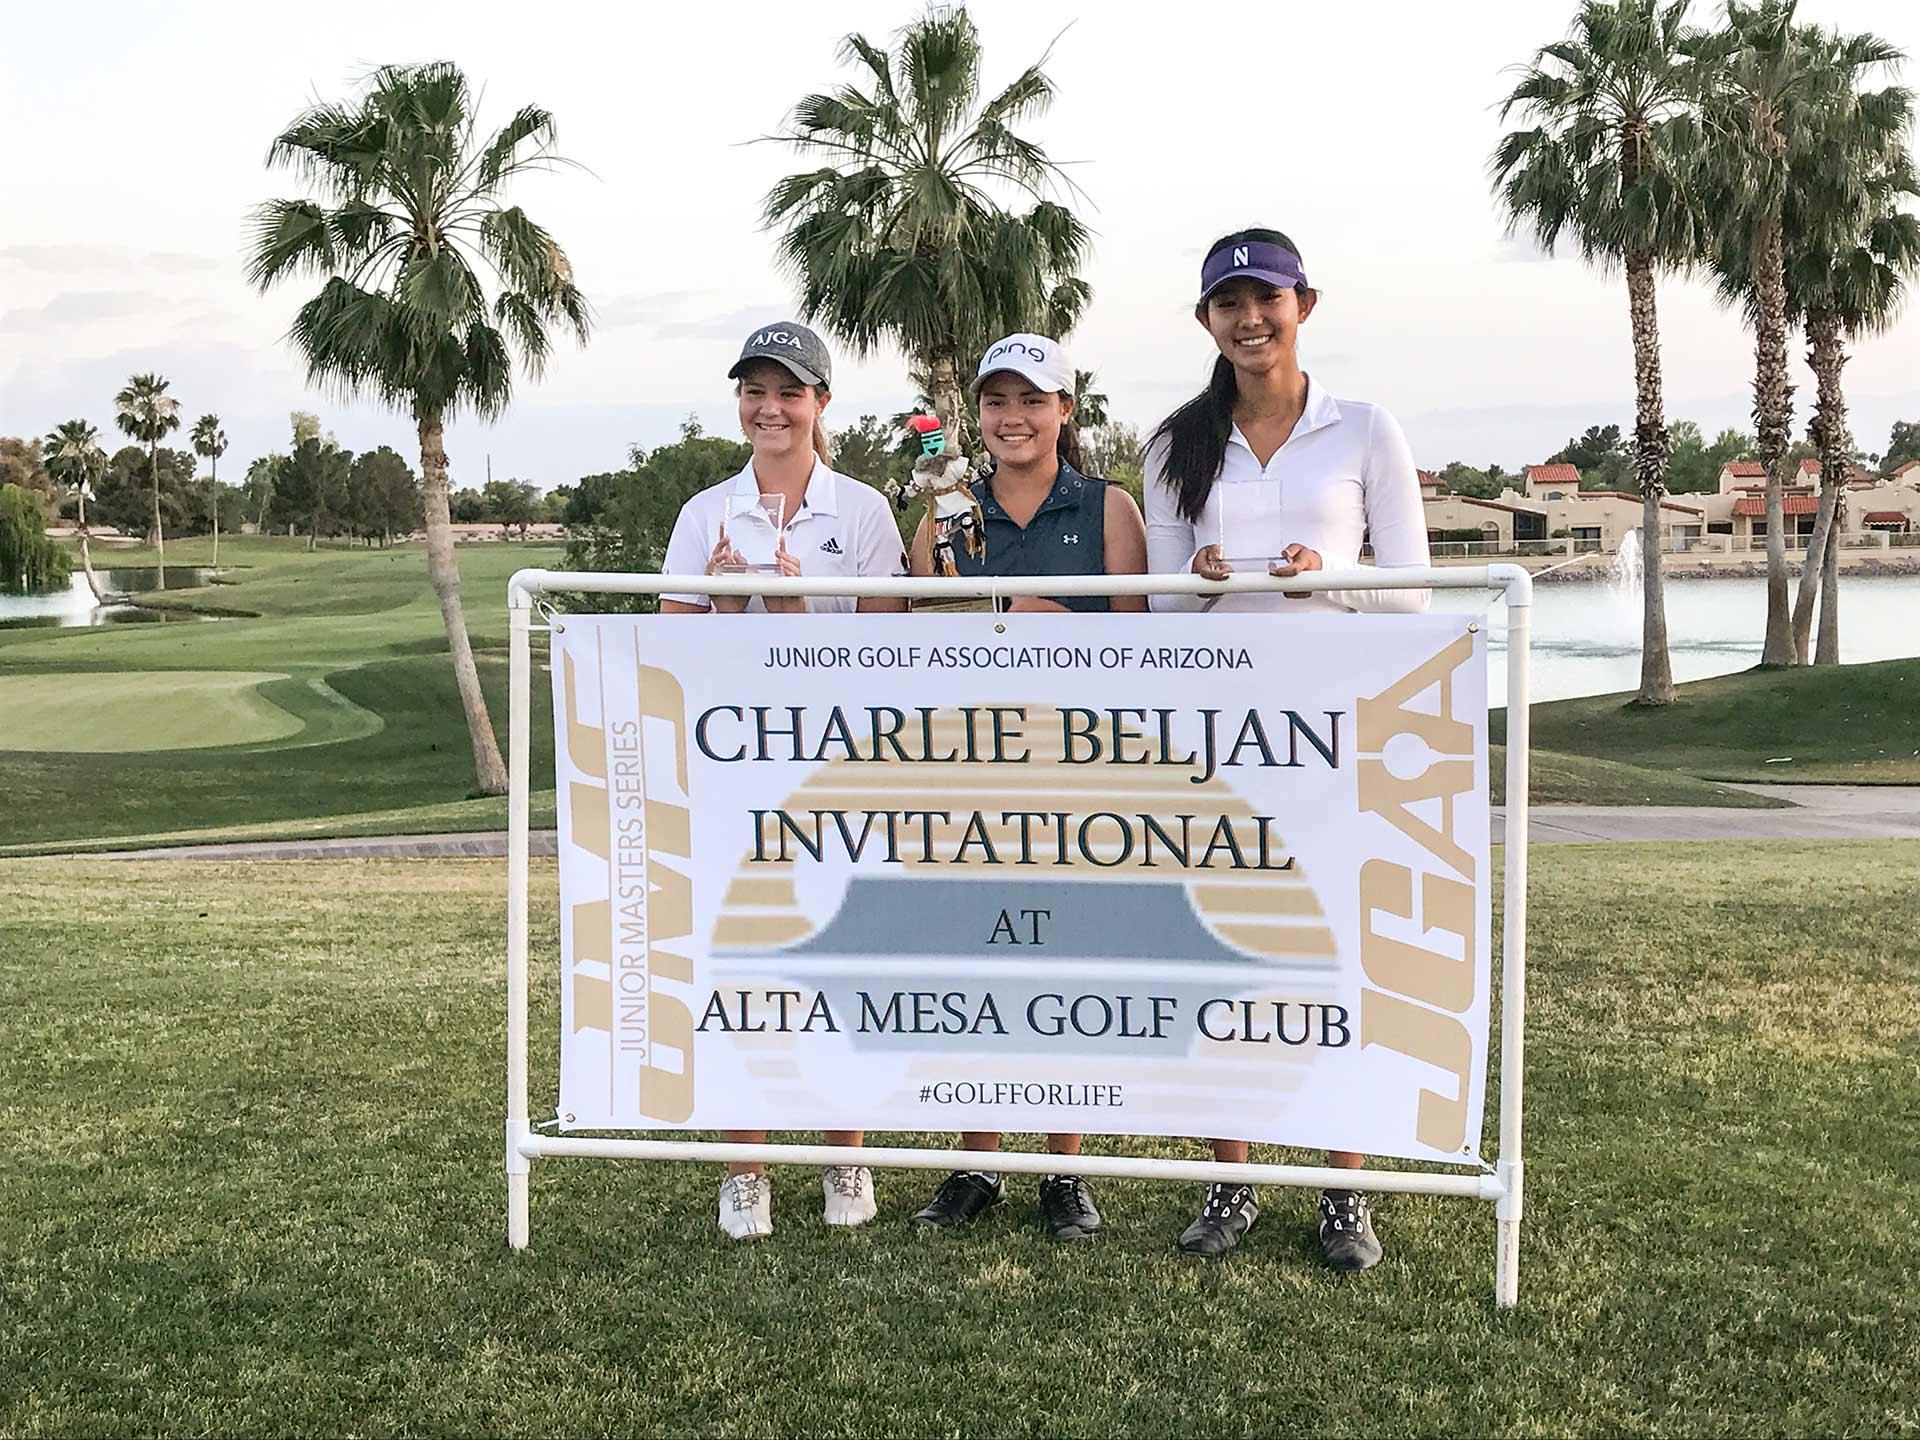 left to right: Madeleine Laux, Ashley Menne, Kelly Su